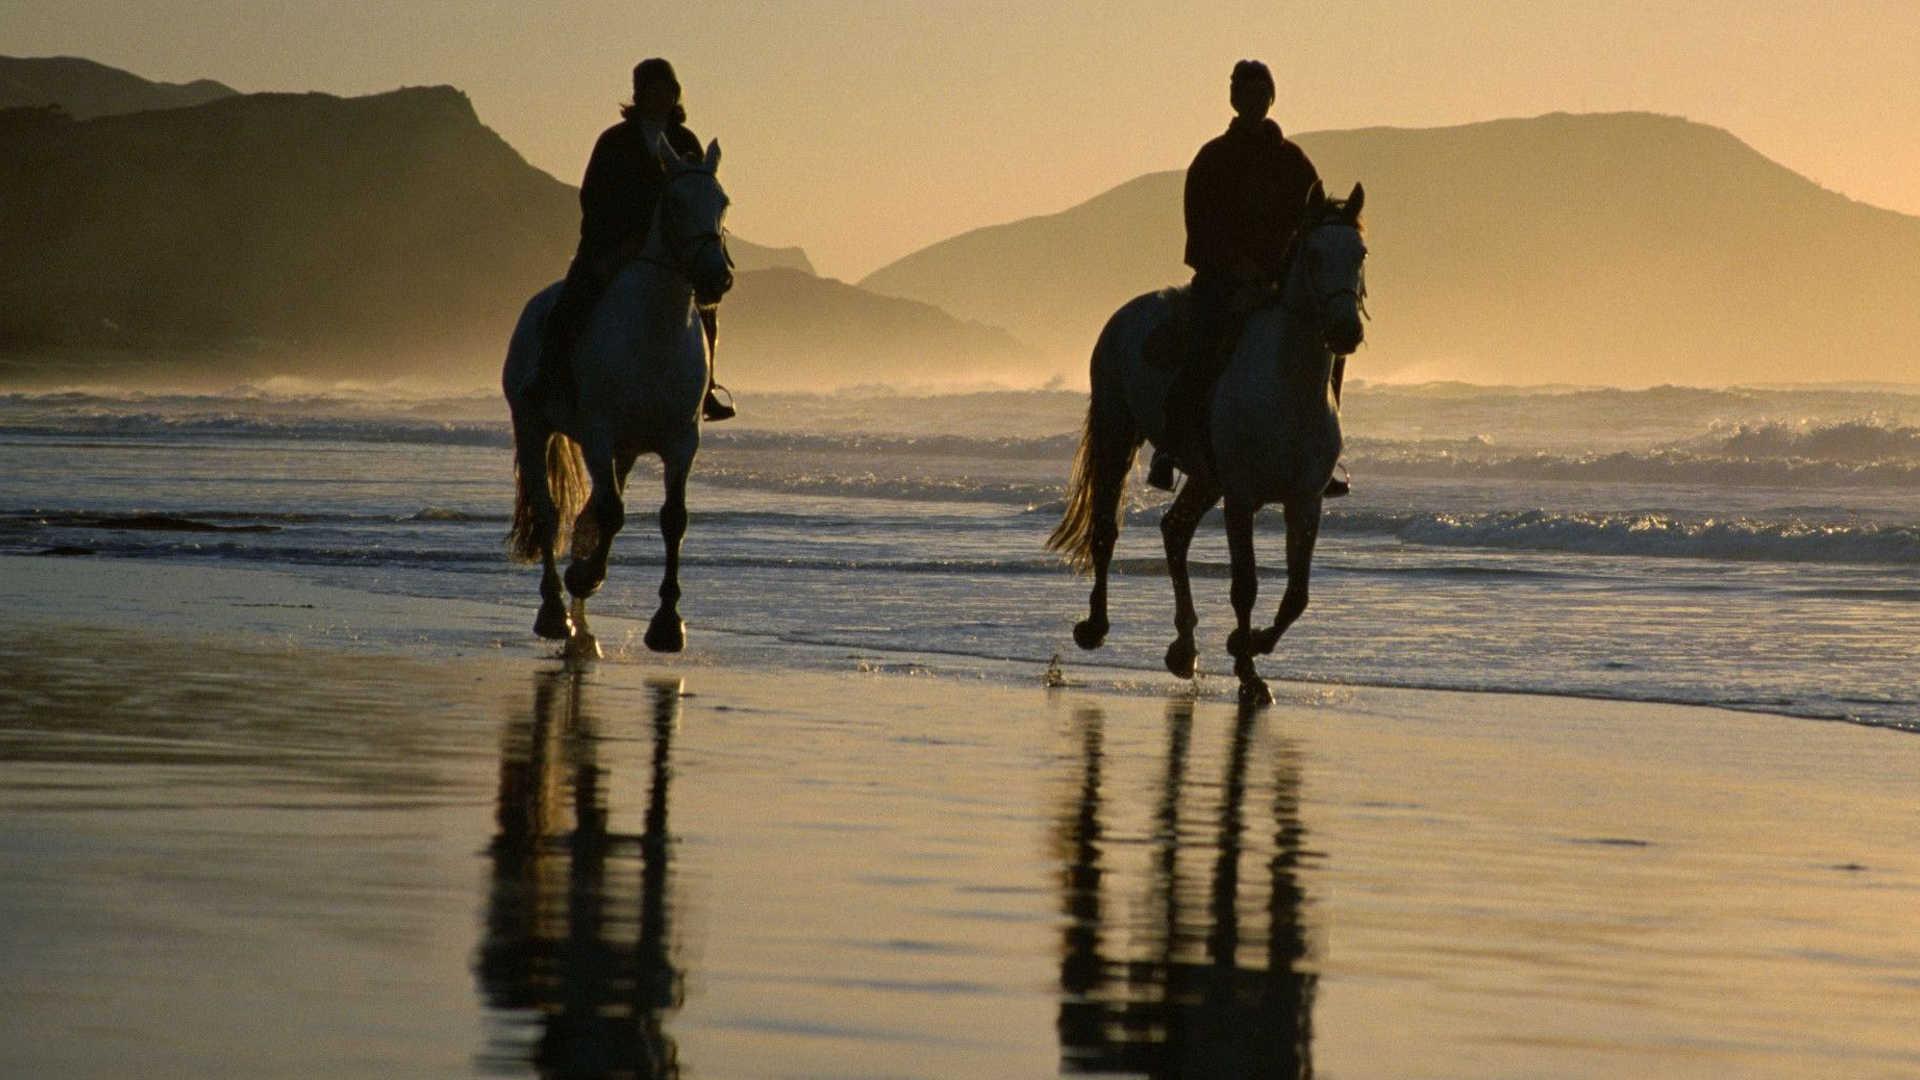 http://louladakis-apts.gr/wp-content/uploads/2016/05/louladakis_activities_horse_riding.jpg